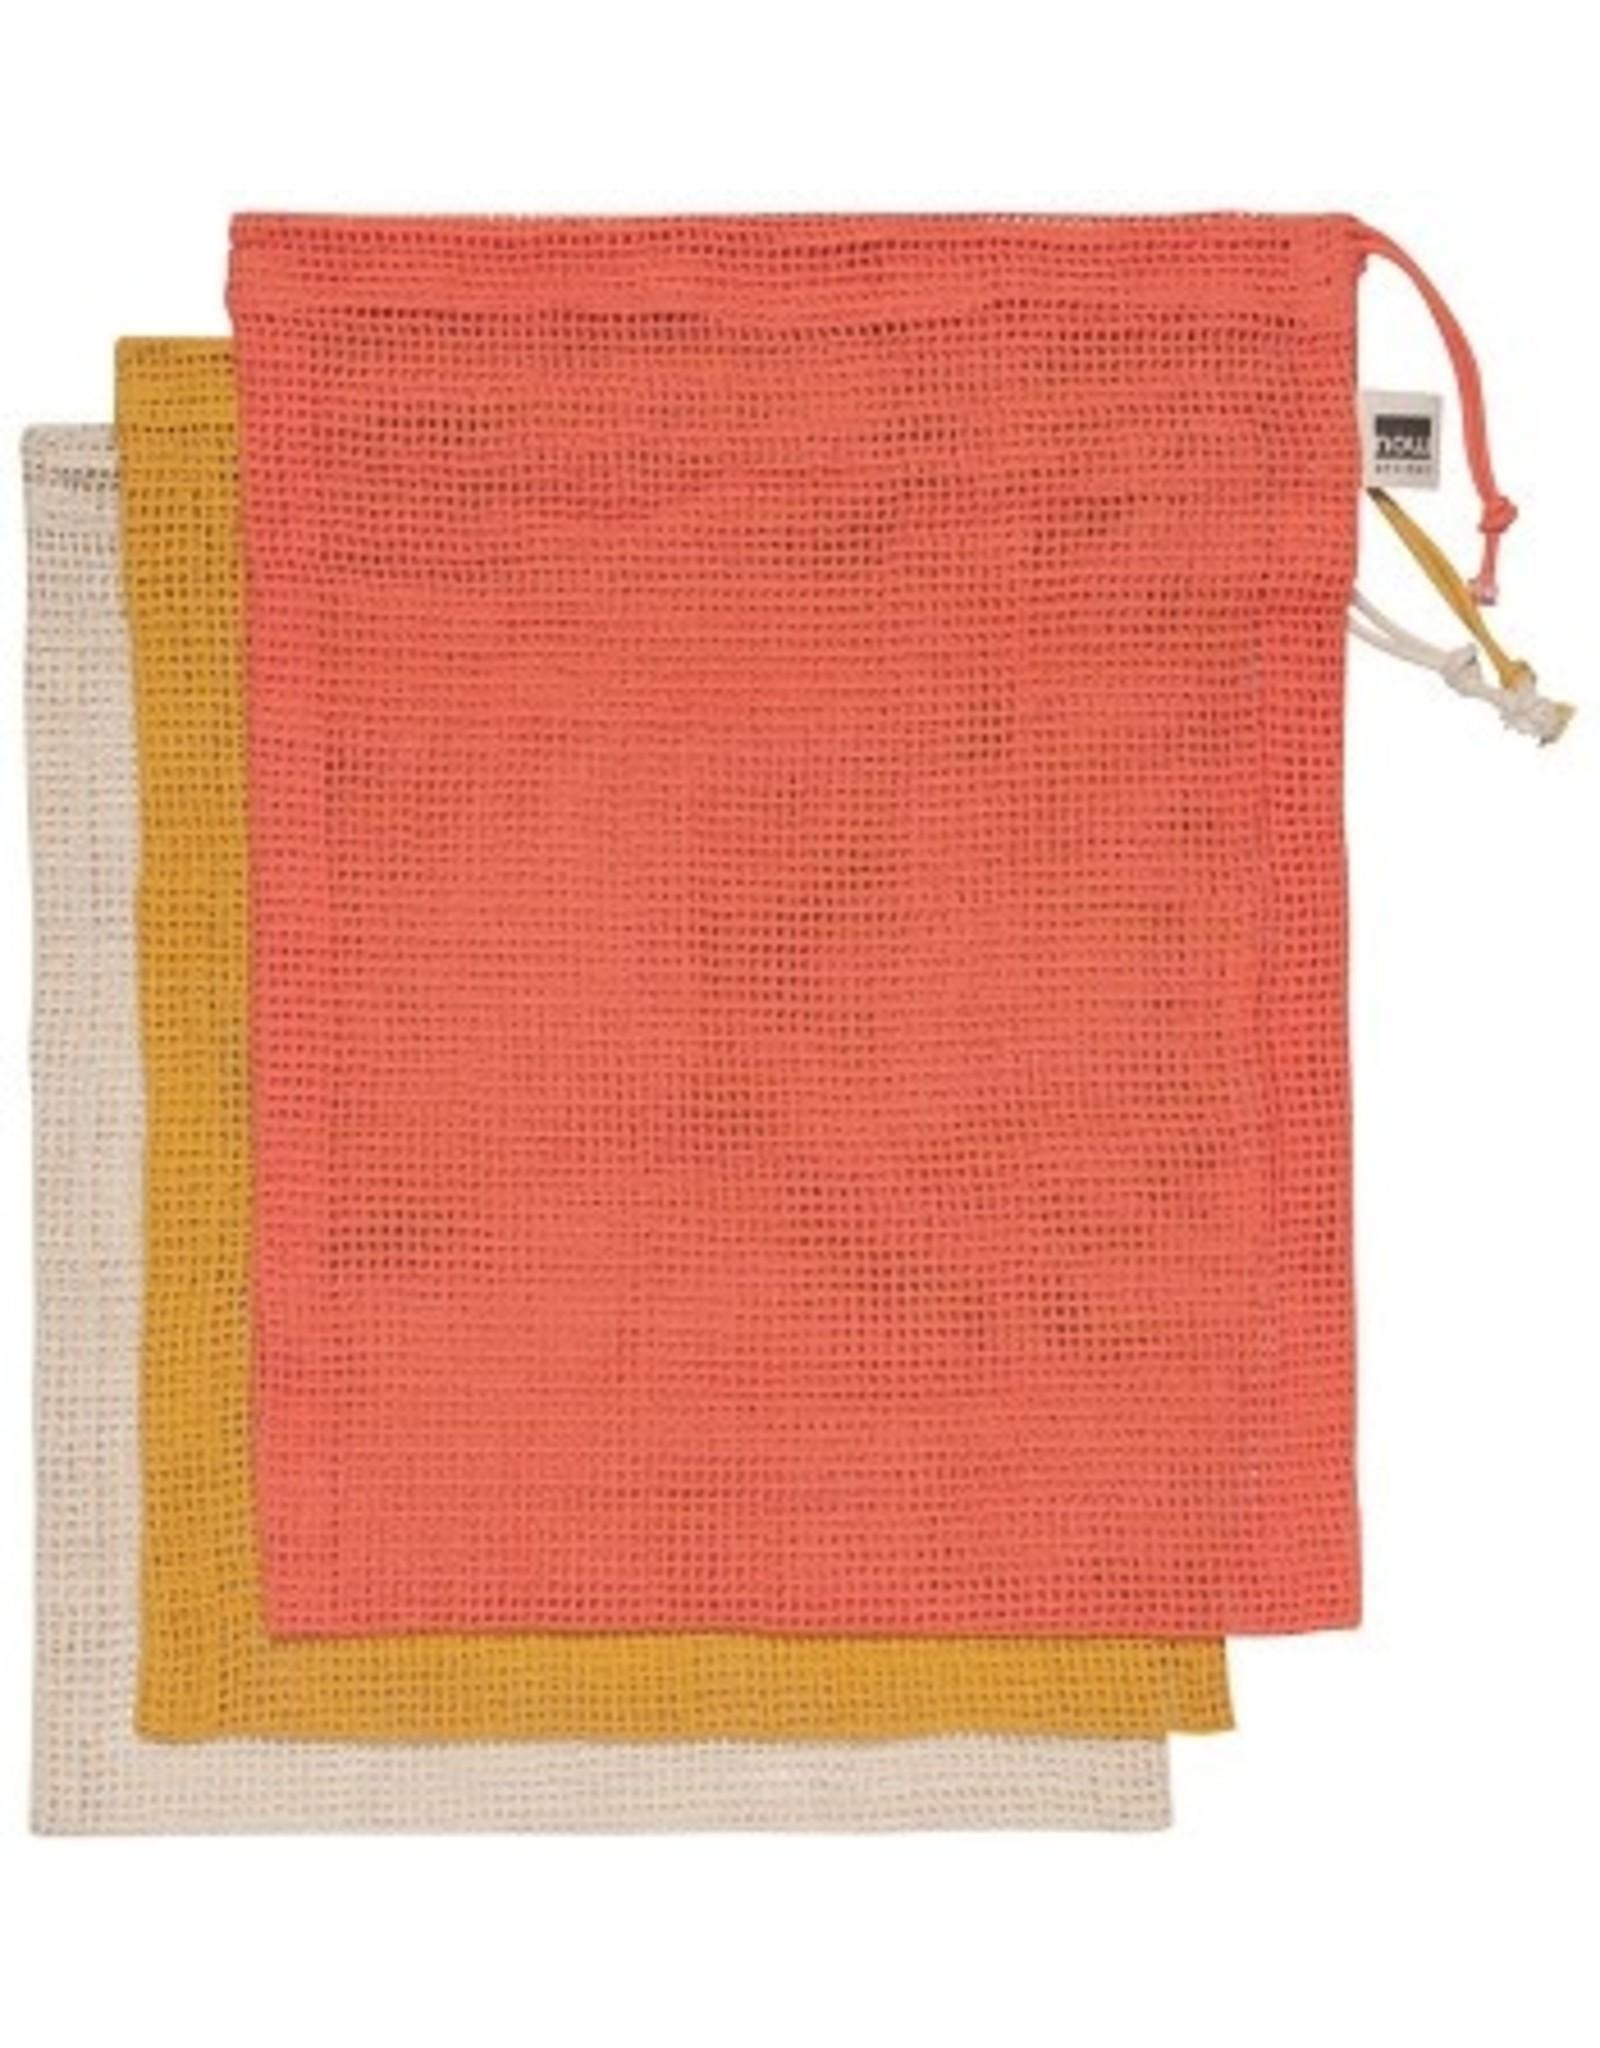 DCA - Produce Bag Set/La Marche Coral